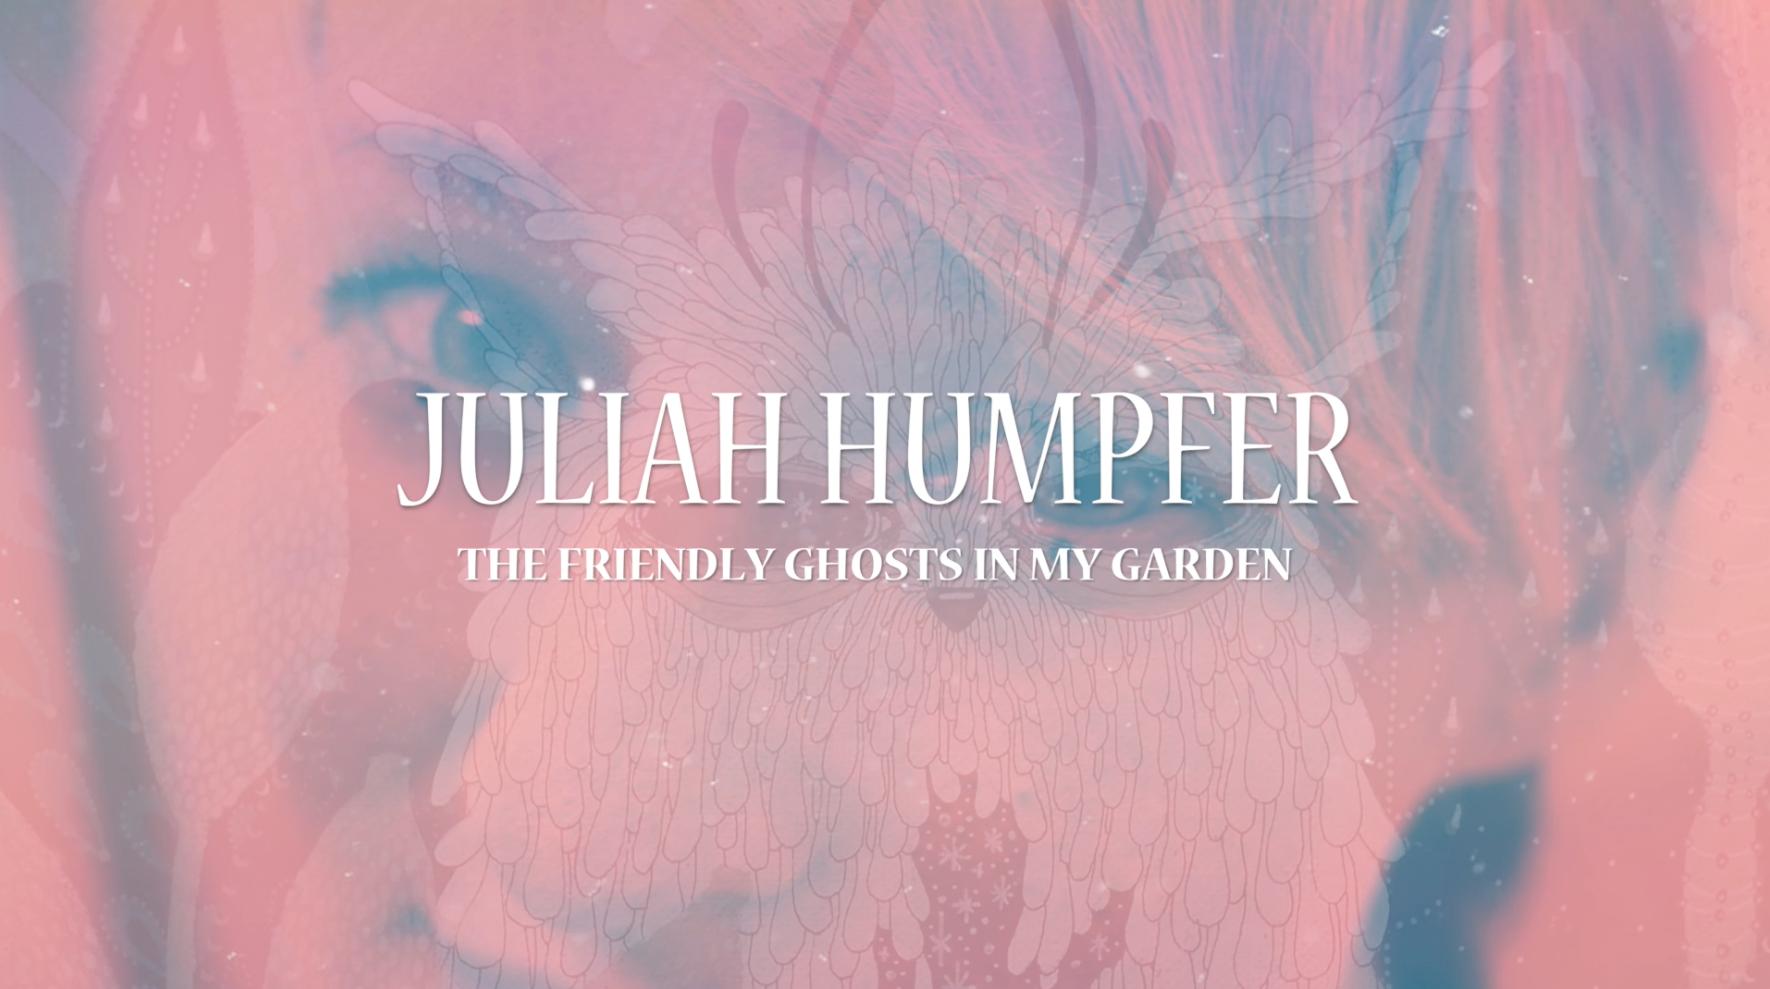 Juliah Humpfer – The friendly ghosts in my garden